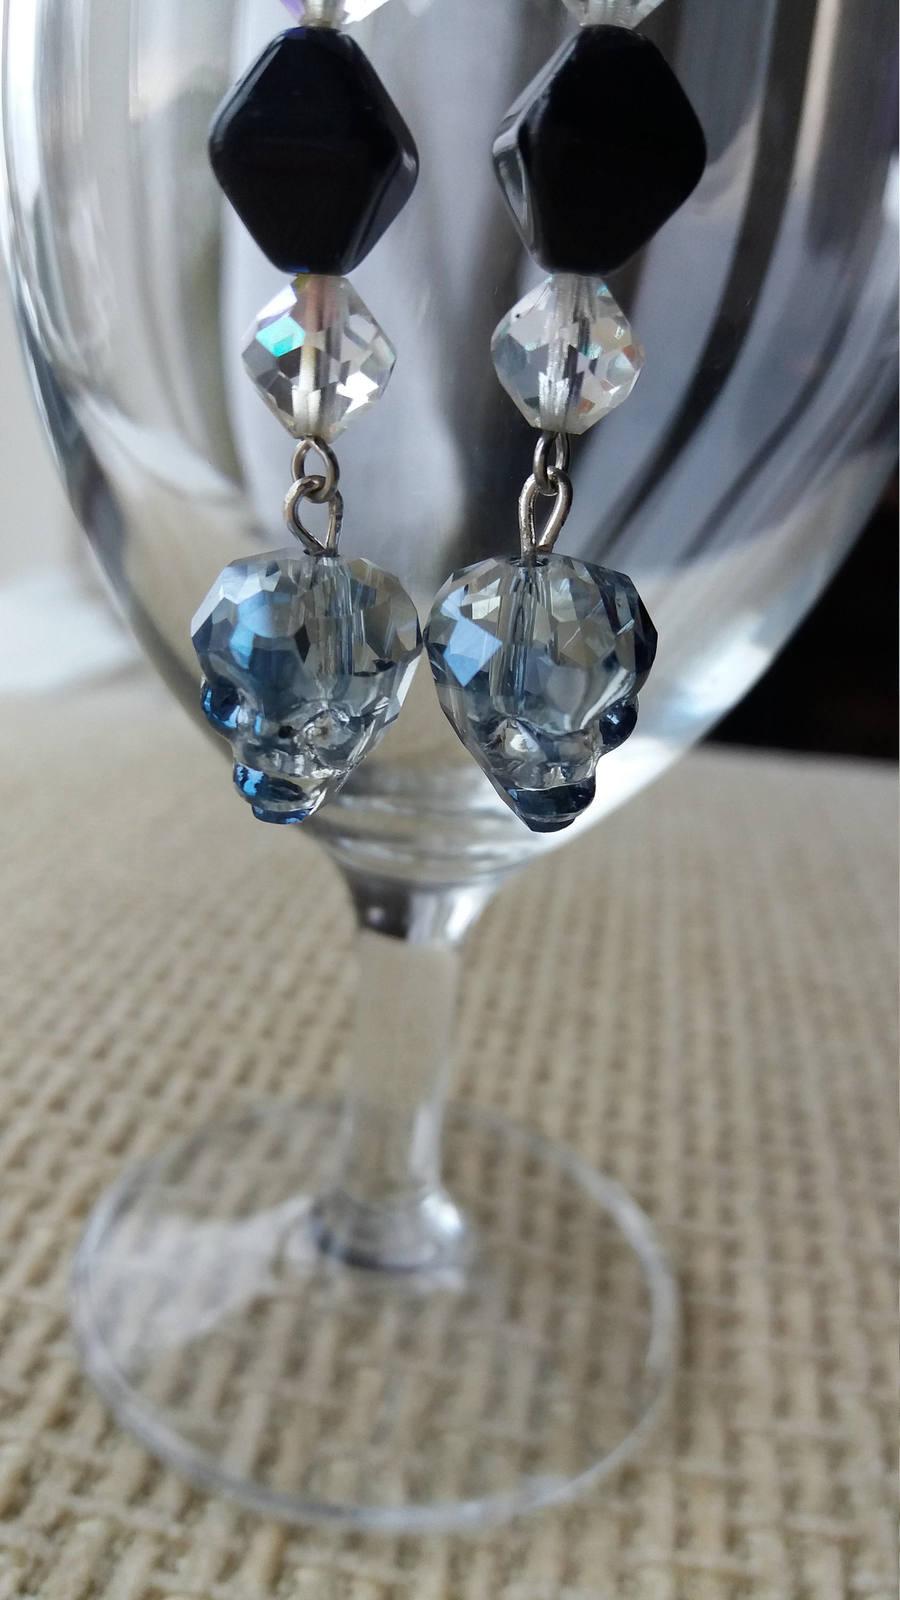 Swarovski crystal Skulls earrings Wedding jewelry Gift for her Crystal earrings